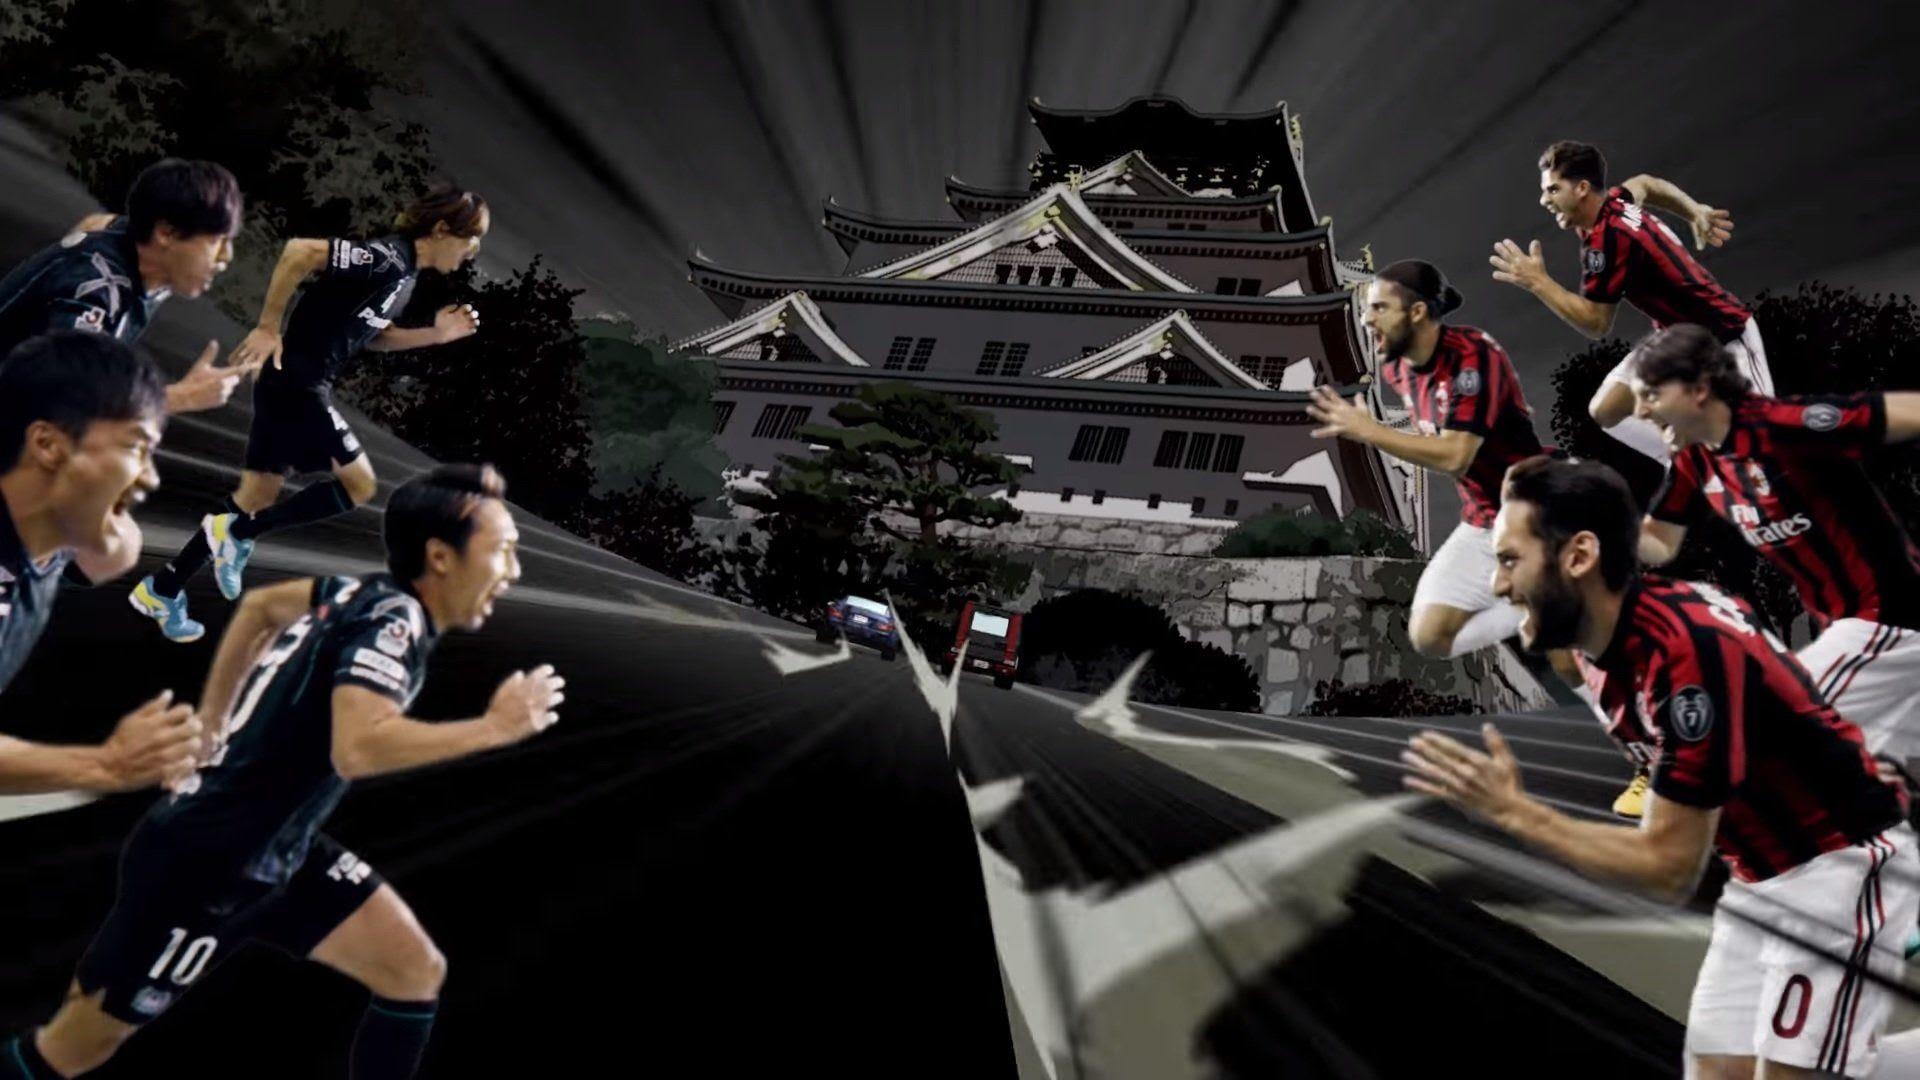 Risultati immagini per AC Milan in Japanimation